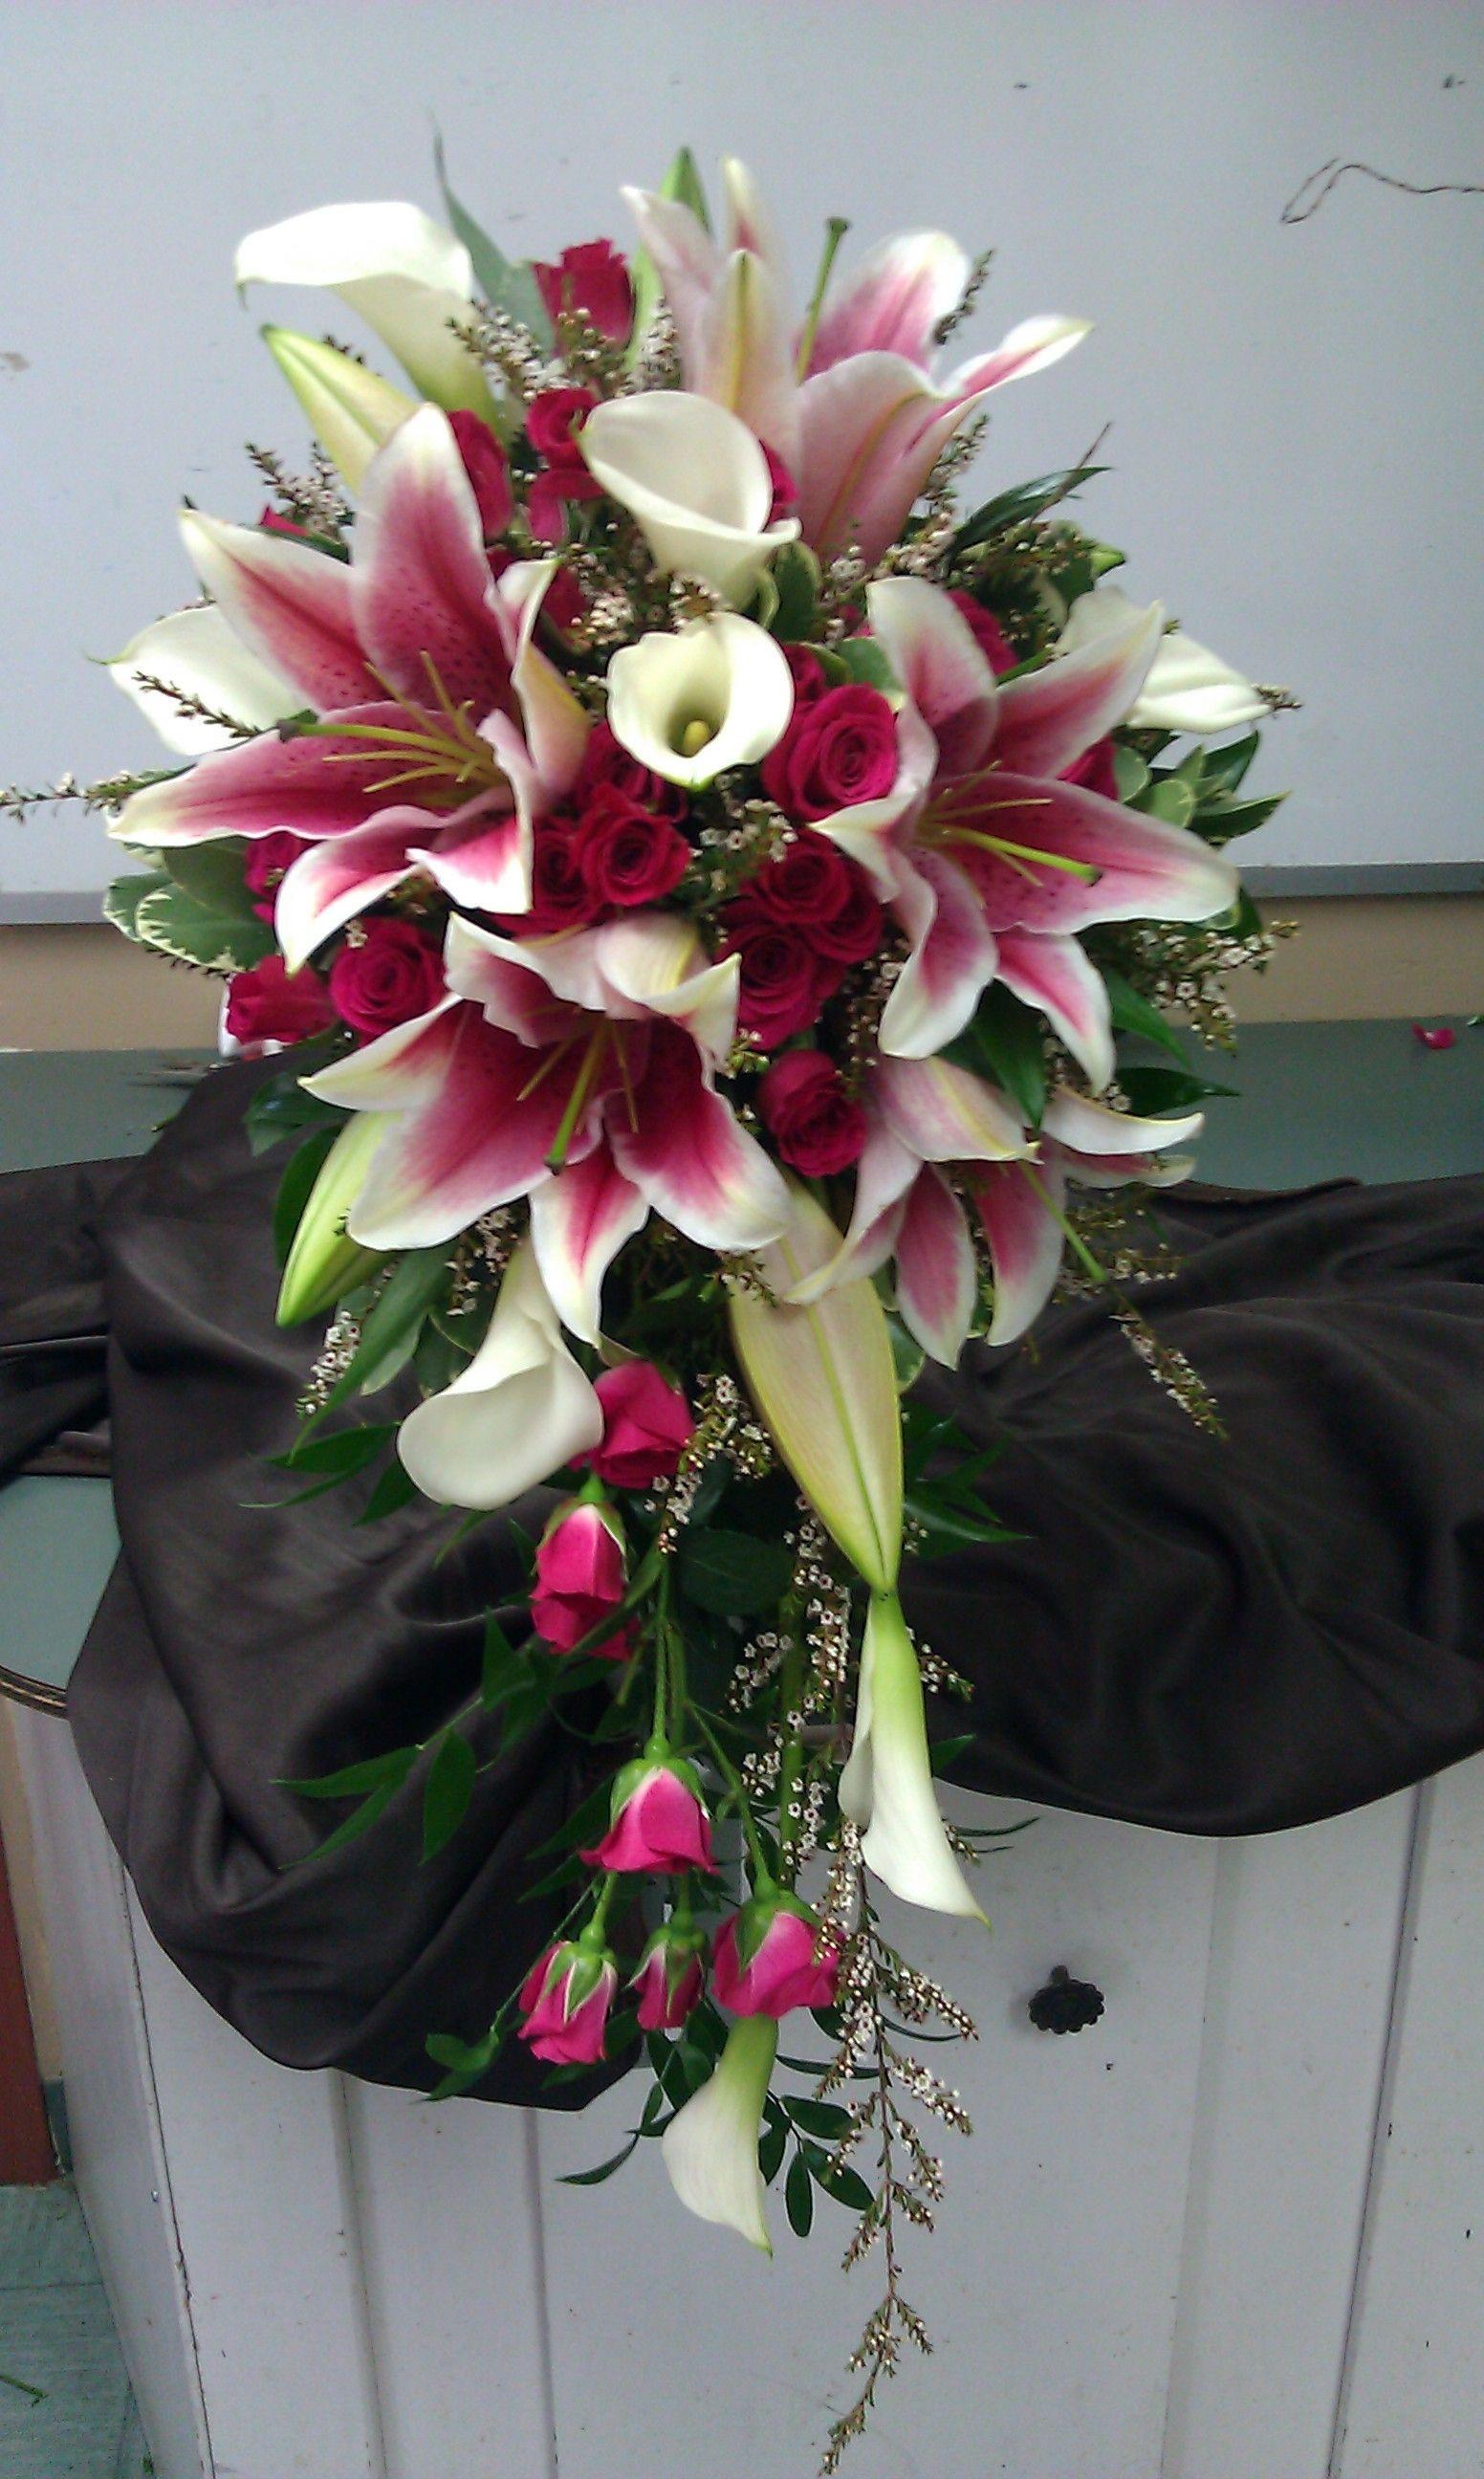 stargazer lily wedding bouquets Gallery